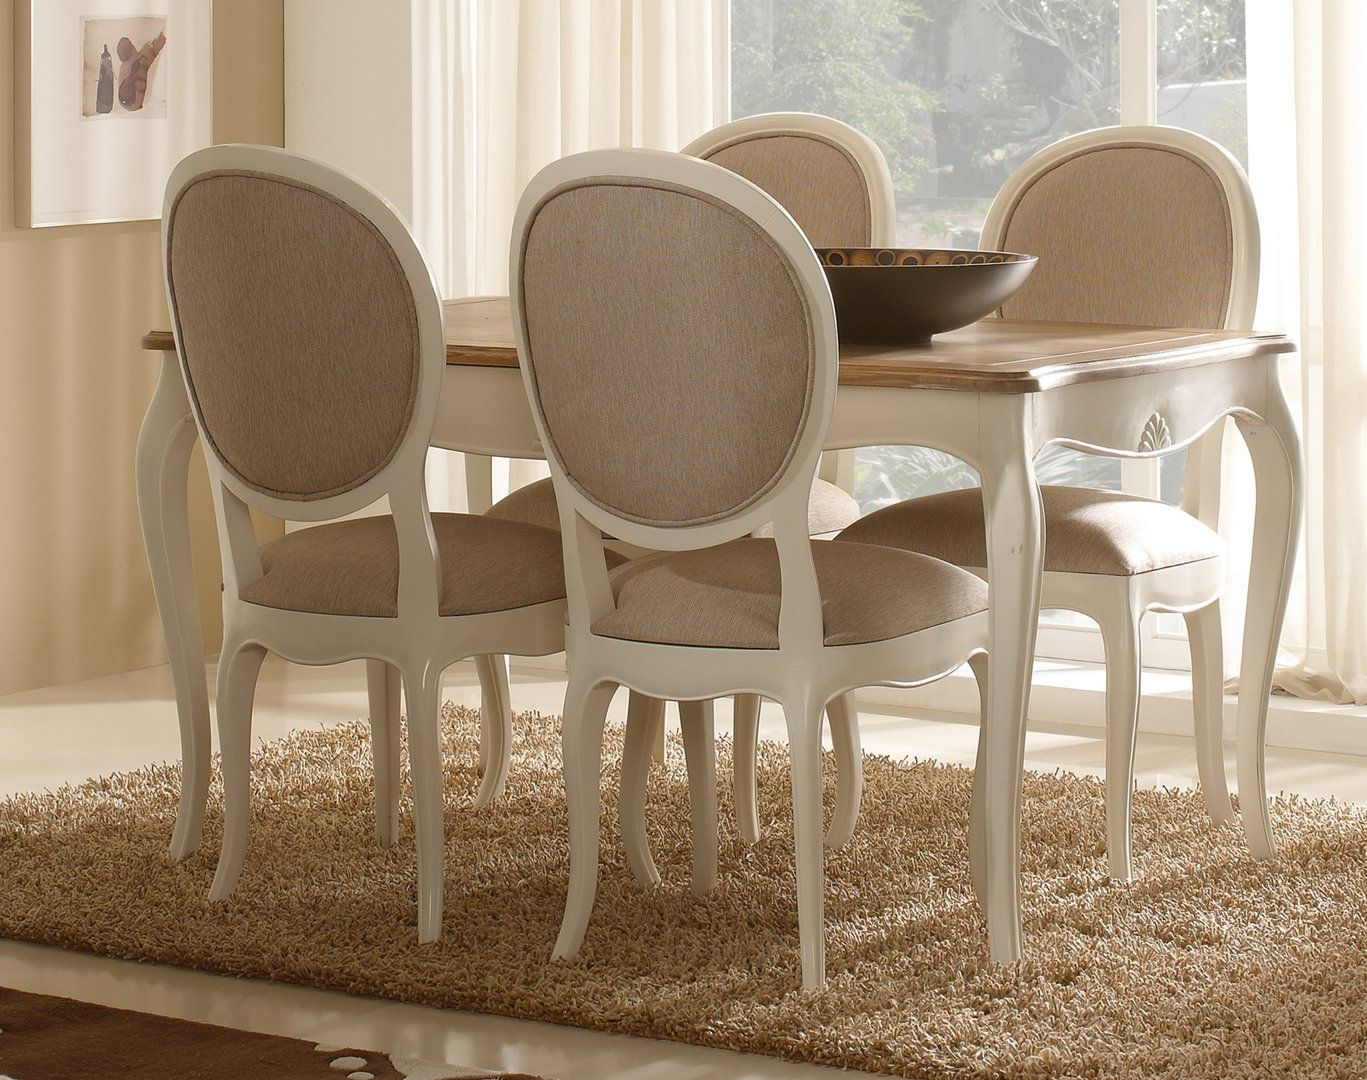 Provenzal muebles muebles para banos pequenos modernos for Muebles provenzales